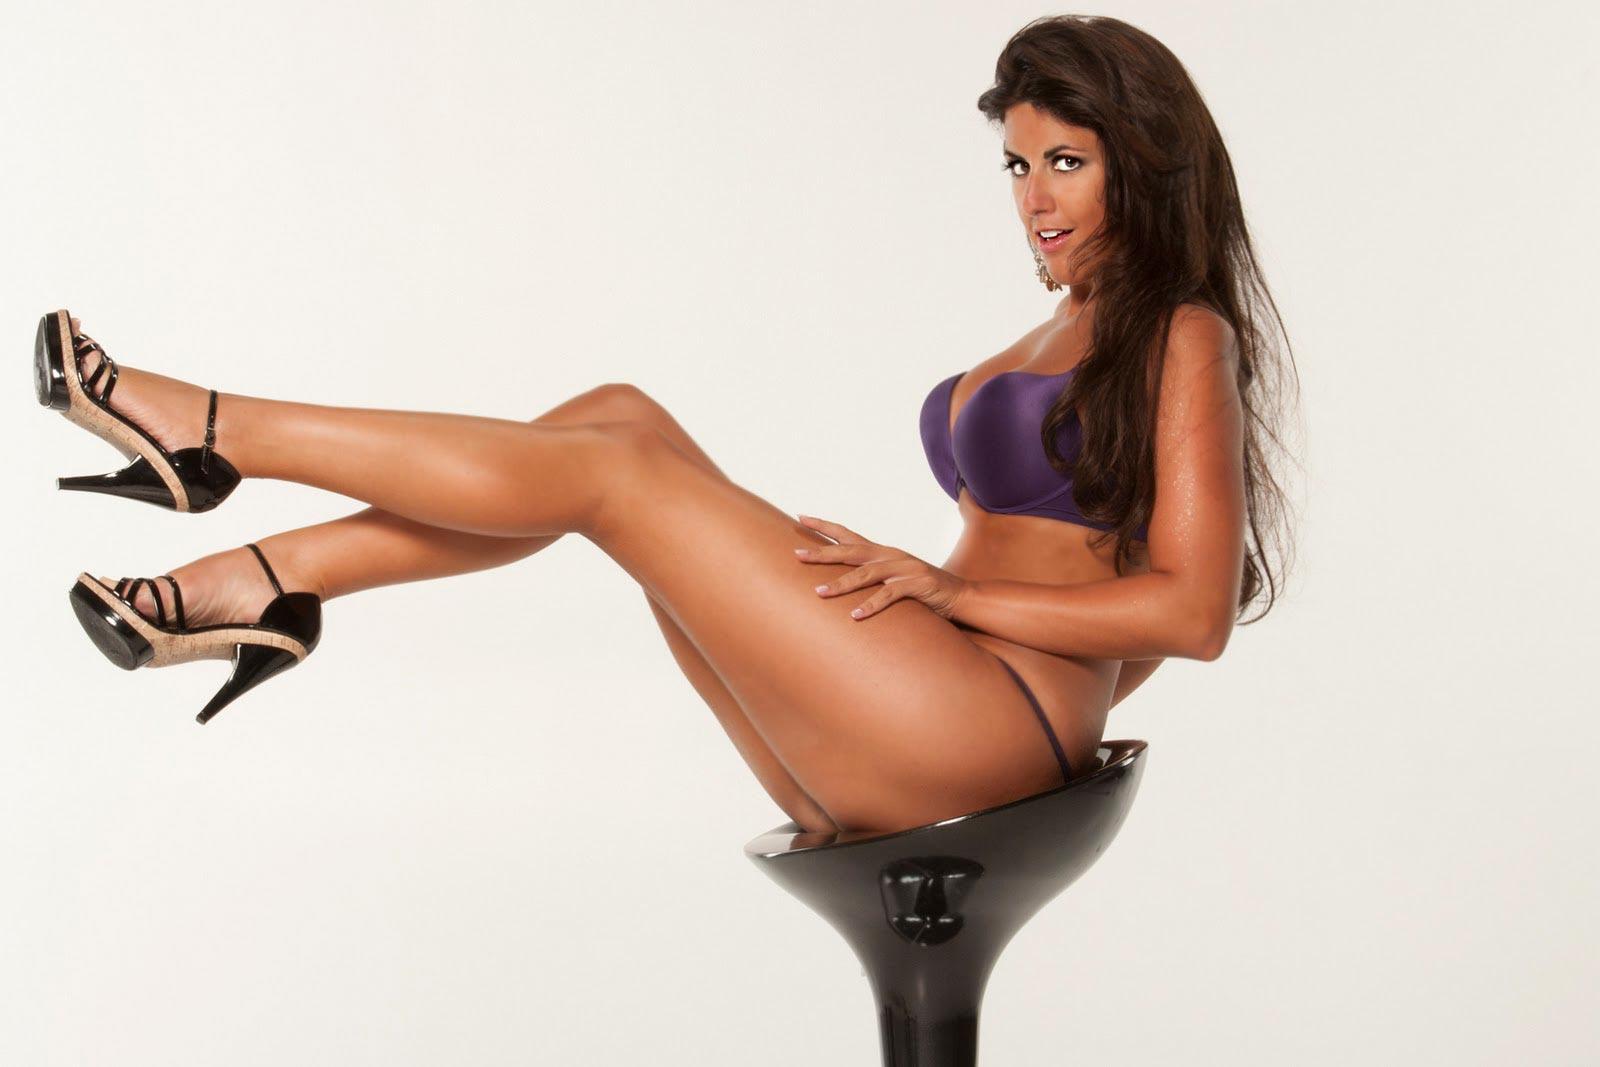 Kira dikhtyar sexy topless 7 photos,Kim Johansson Porn pic Big brother celebrity hijack betting odds emilia out tomorrow,Olga voronova